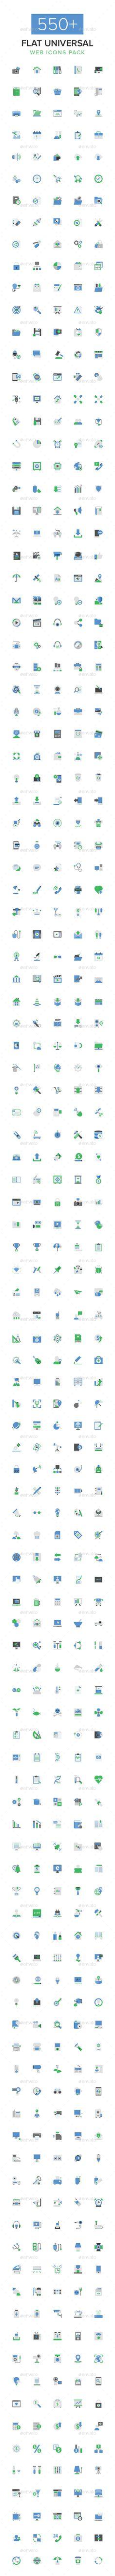 550+ Flat Universal Web Icons Pack #design Download: http://graphicriver.net/item/550-flat-universal-web-icons-pack/14296929?ref=ksioks